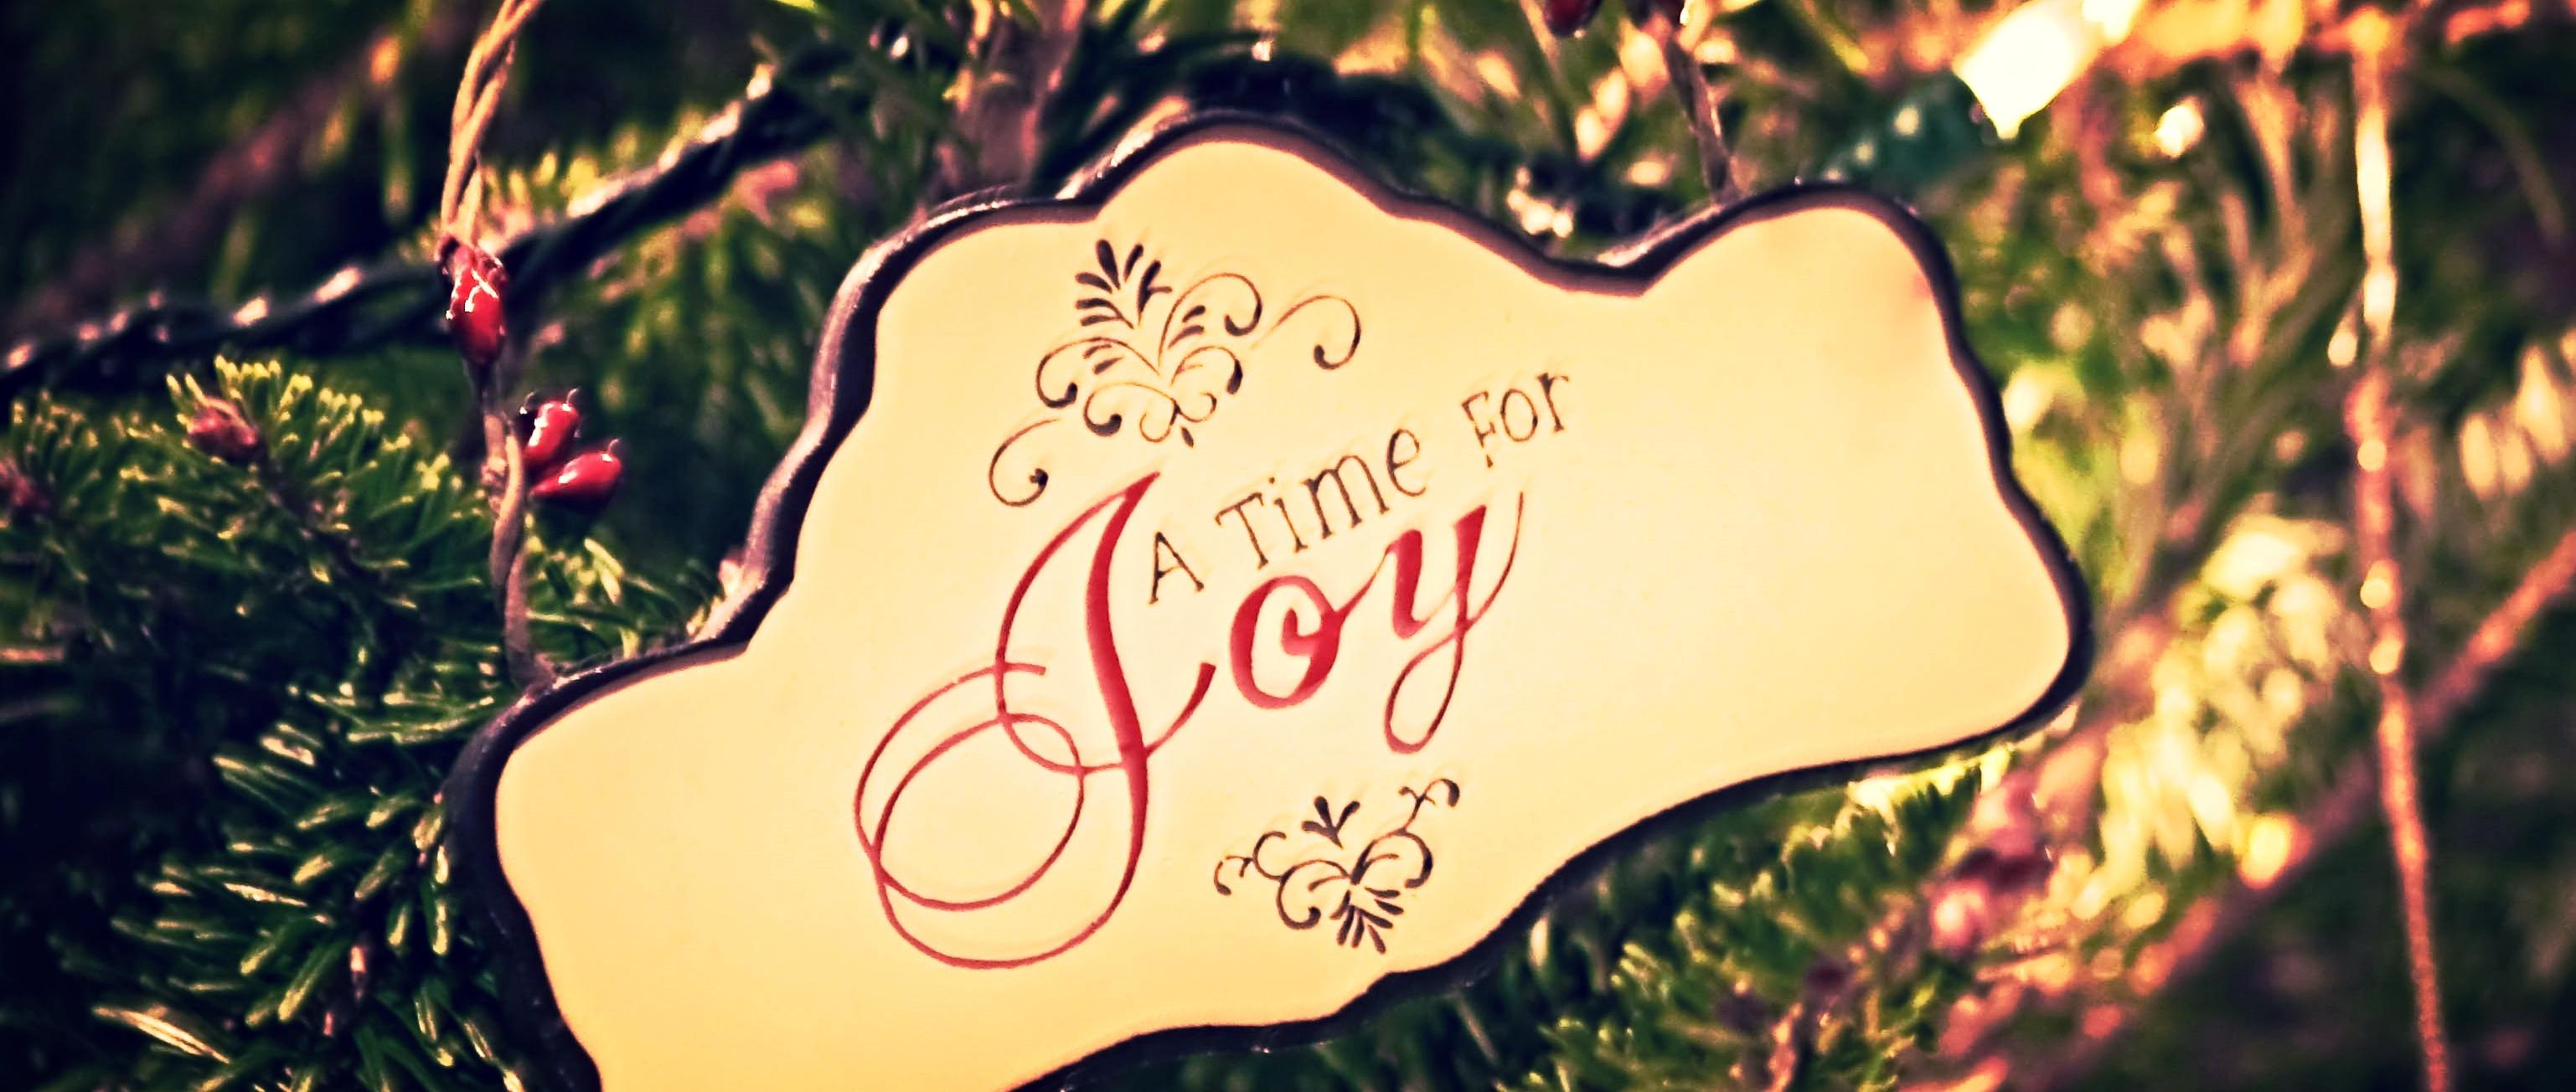 "A Christmas ornament that says ""The Season for Joy"""